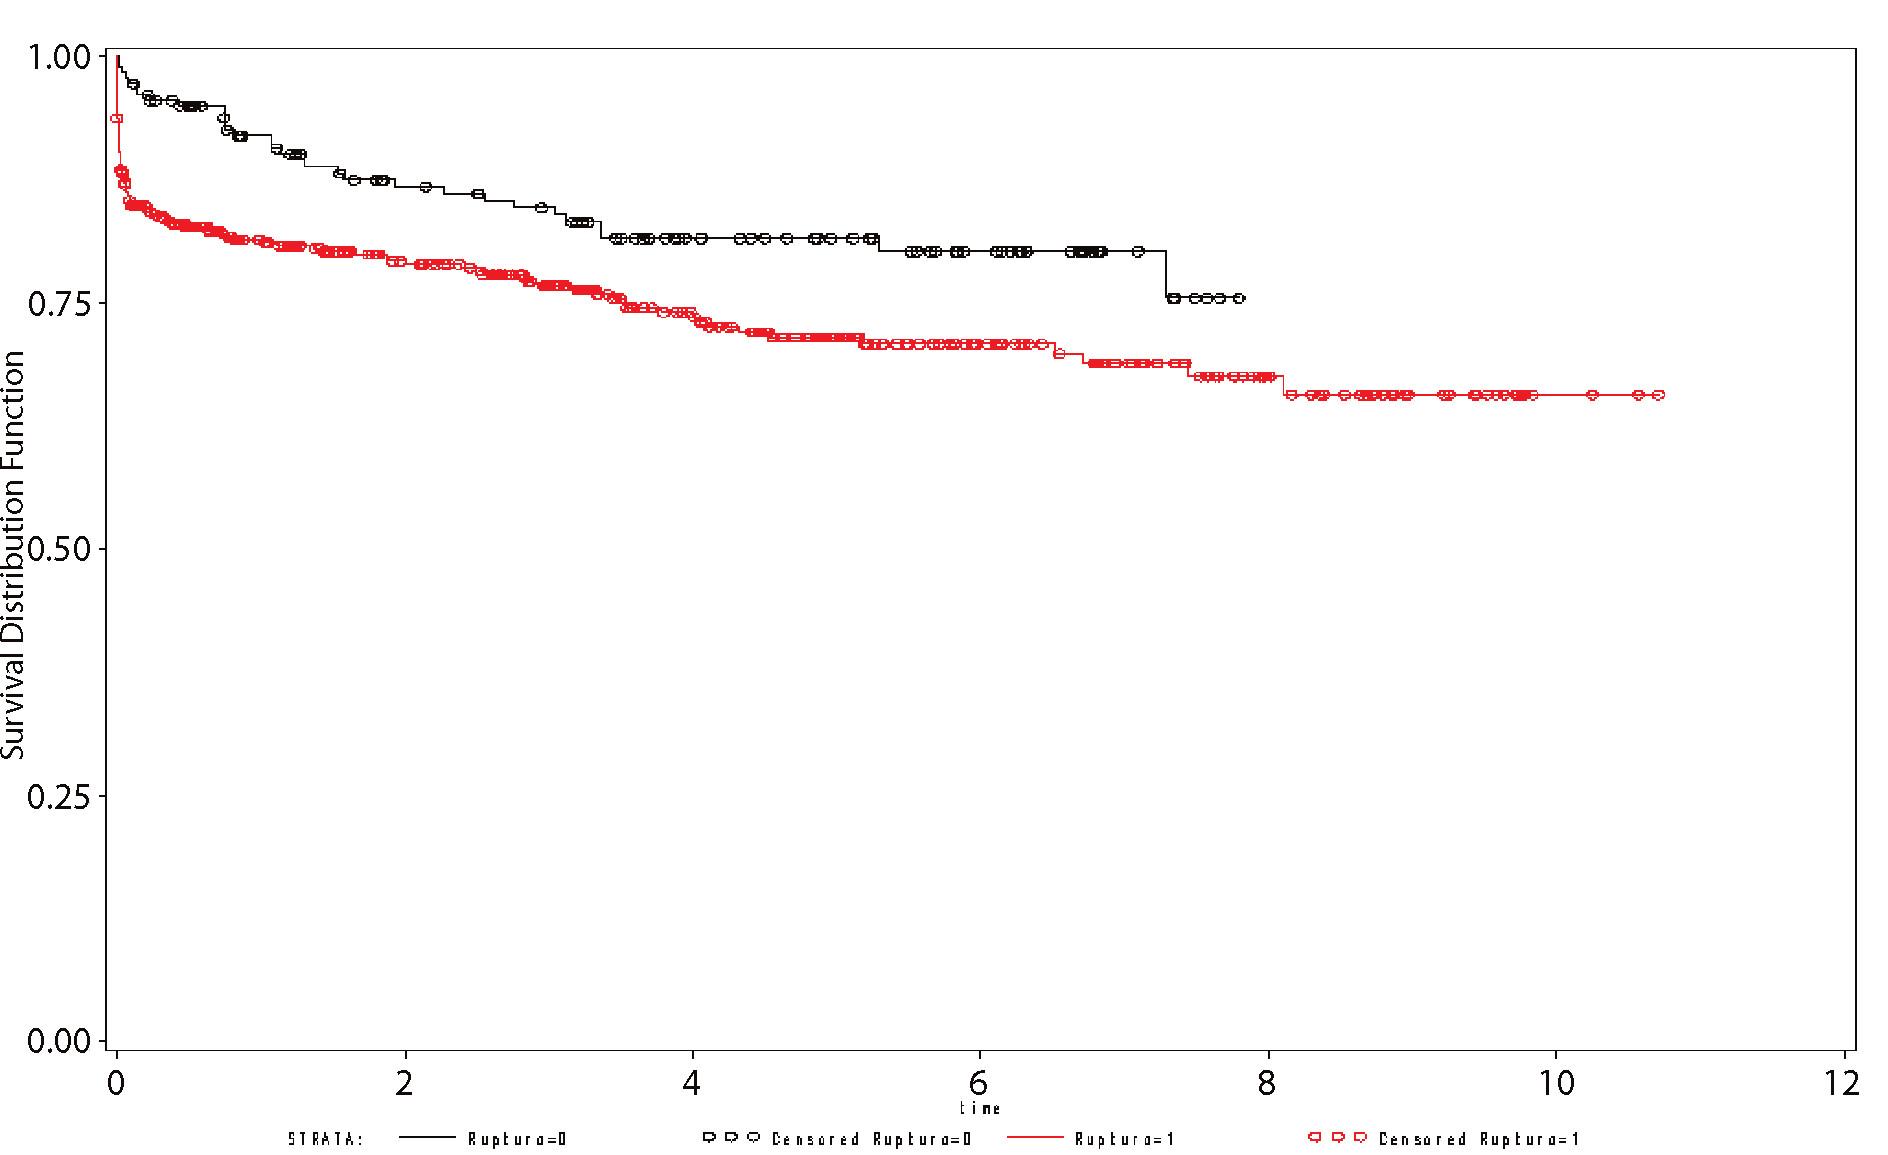 Dlouhodobé přežívání nemocných po OR a EVAR Graph 3. Long-term survival in patients following open and endovascular procedures